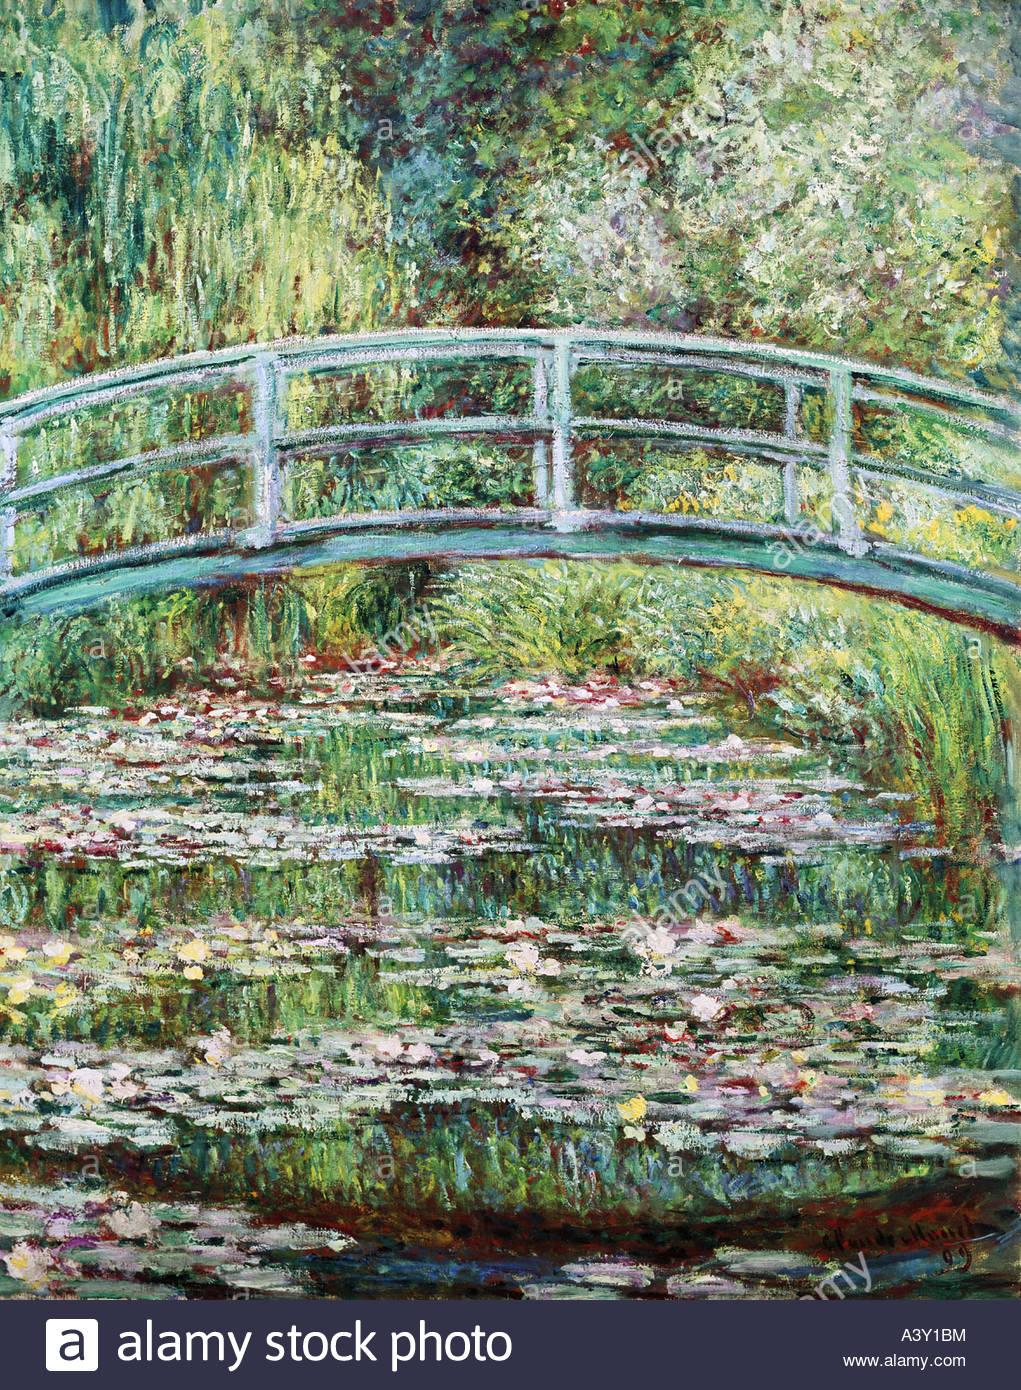 """fine arts, Monet, Claude, (1840 - 1926), painting, ""Pont Japonais a Giverny"", (""Japanese bridge at Giverny""), 1899, Stock Photo"